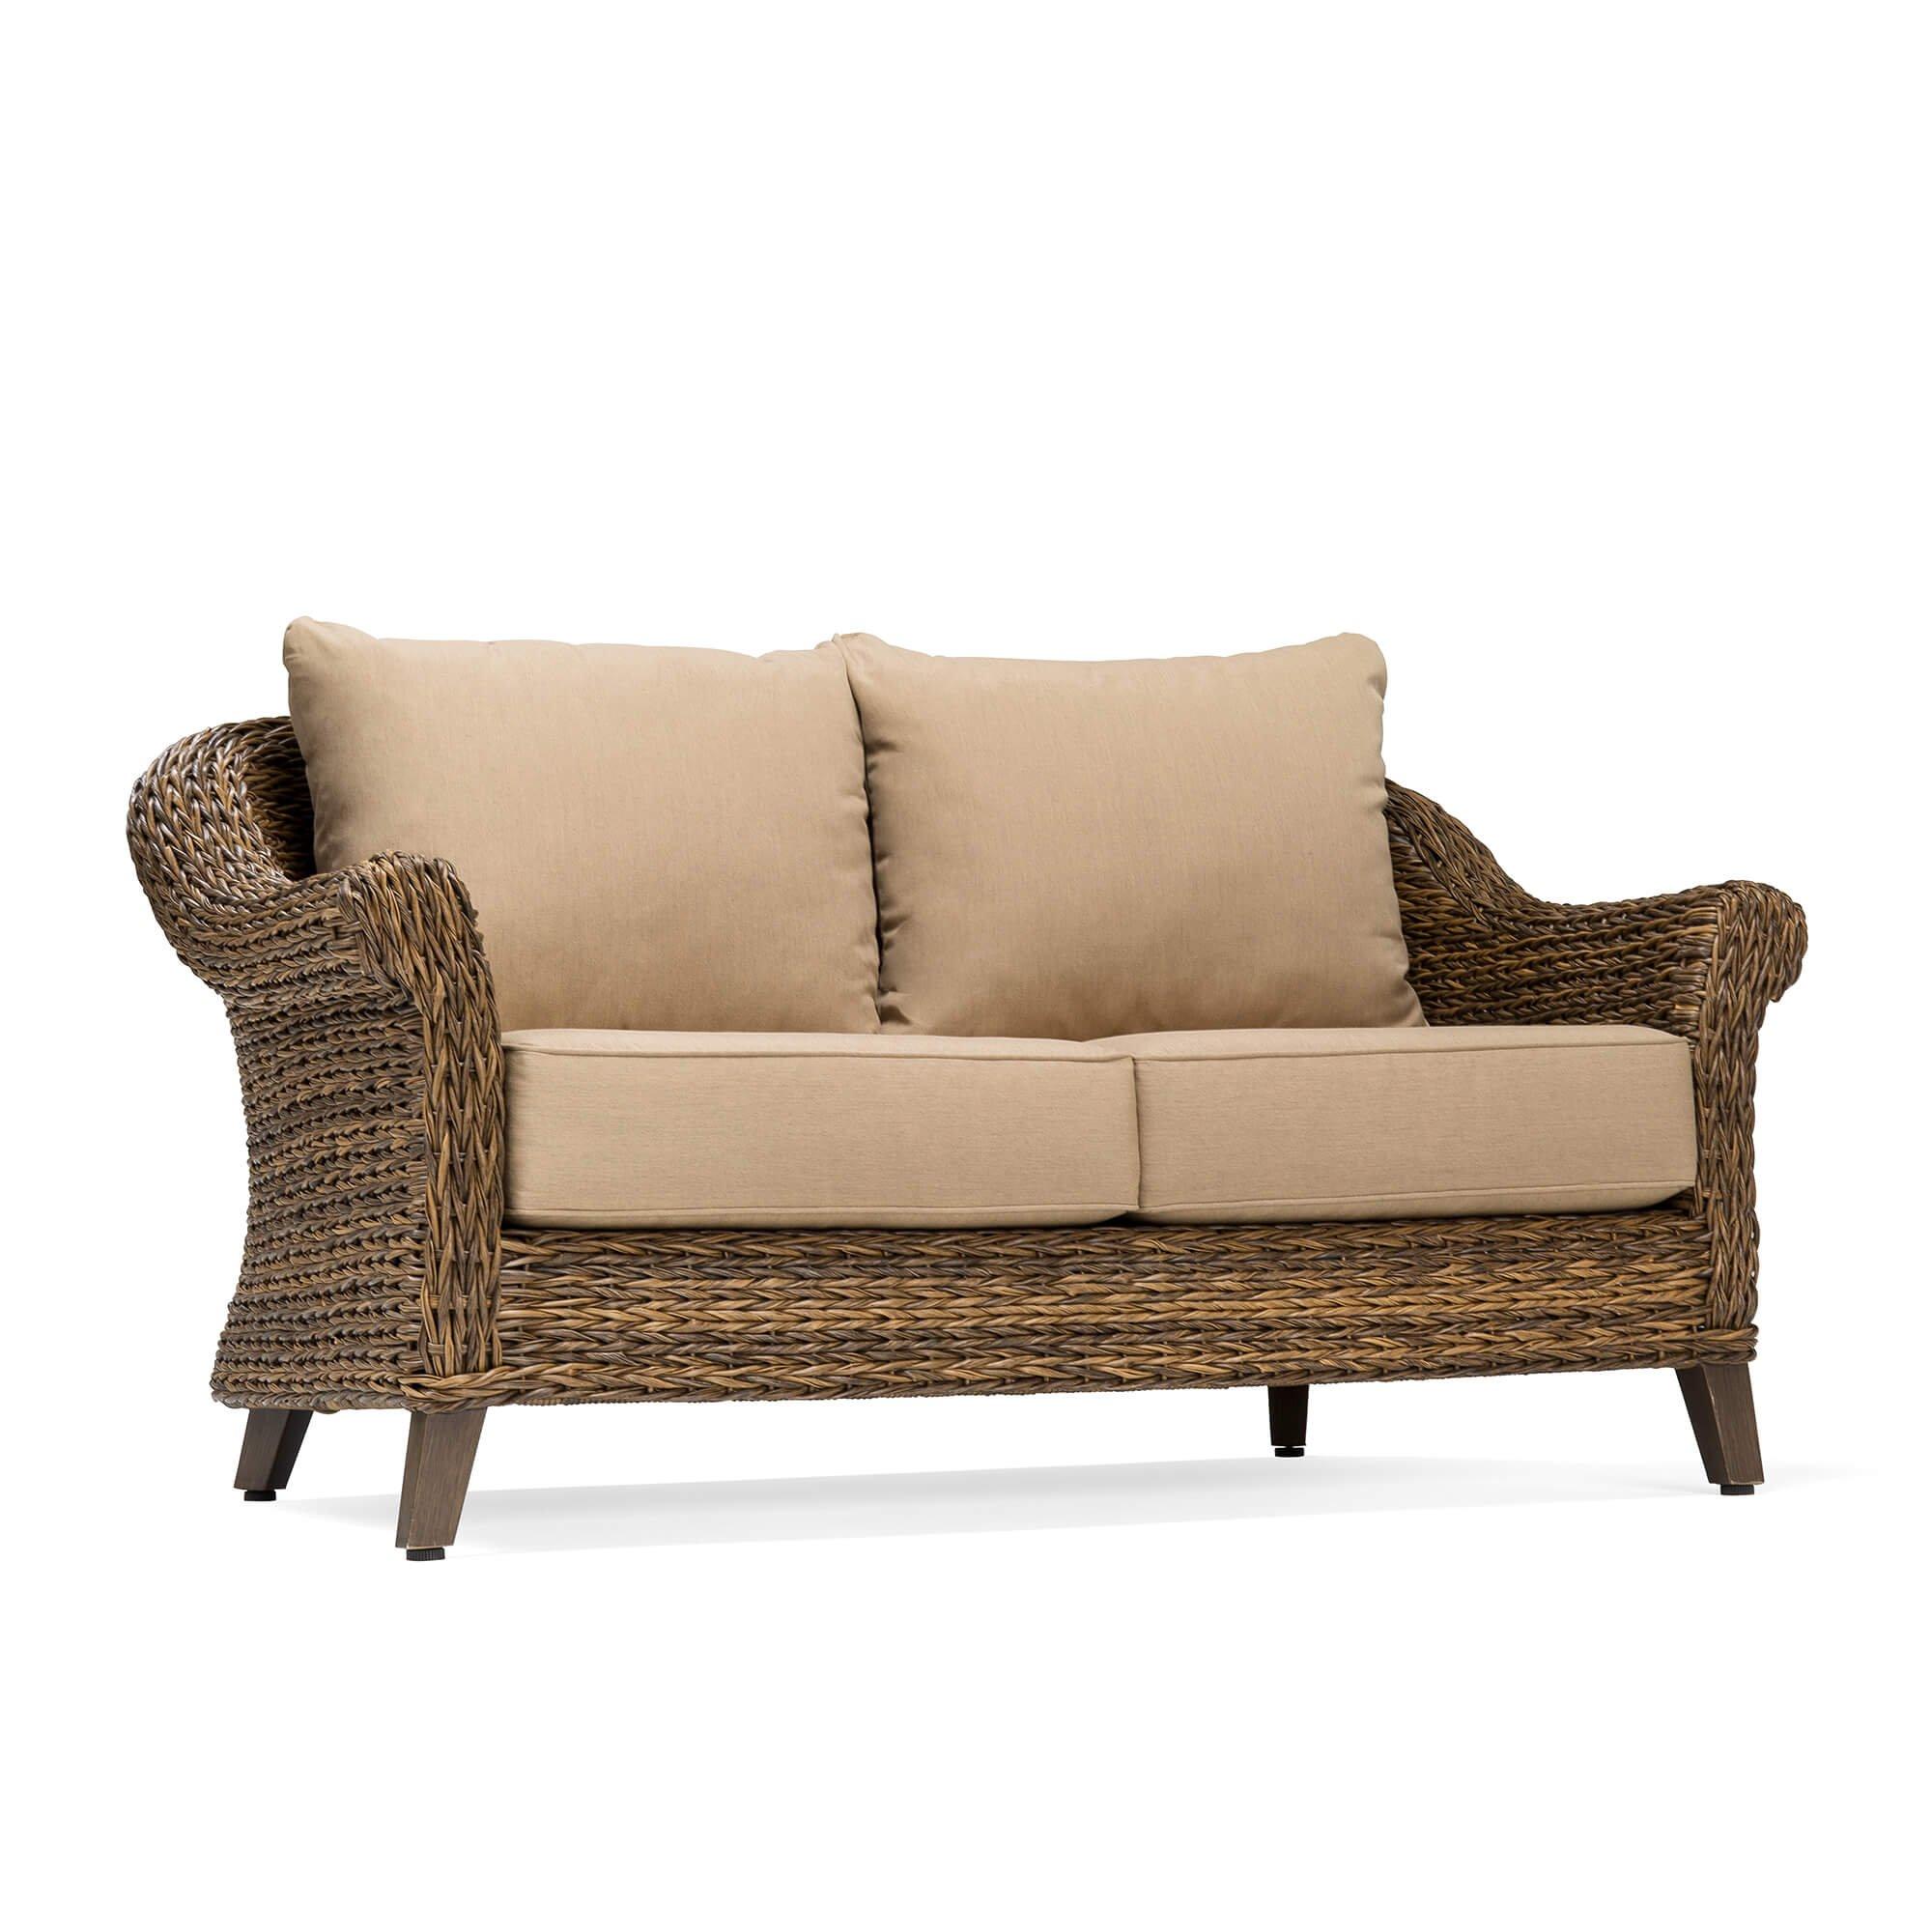 Blue Oak Outdoor Bahamas Patio Furniture Loveseat with Sunbrella Canvas Heather Beige Cushions